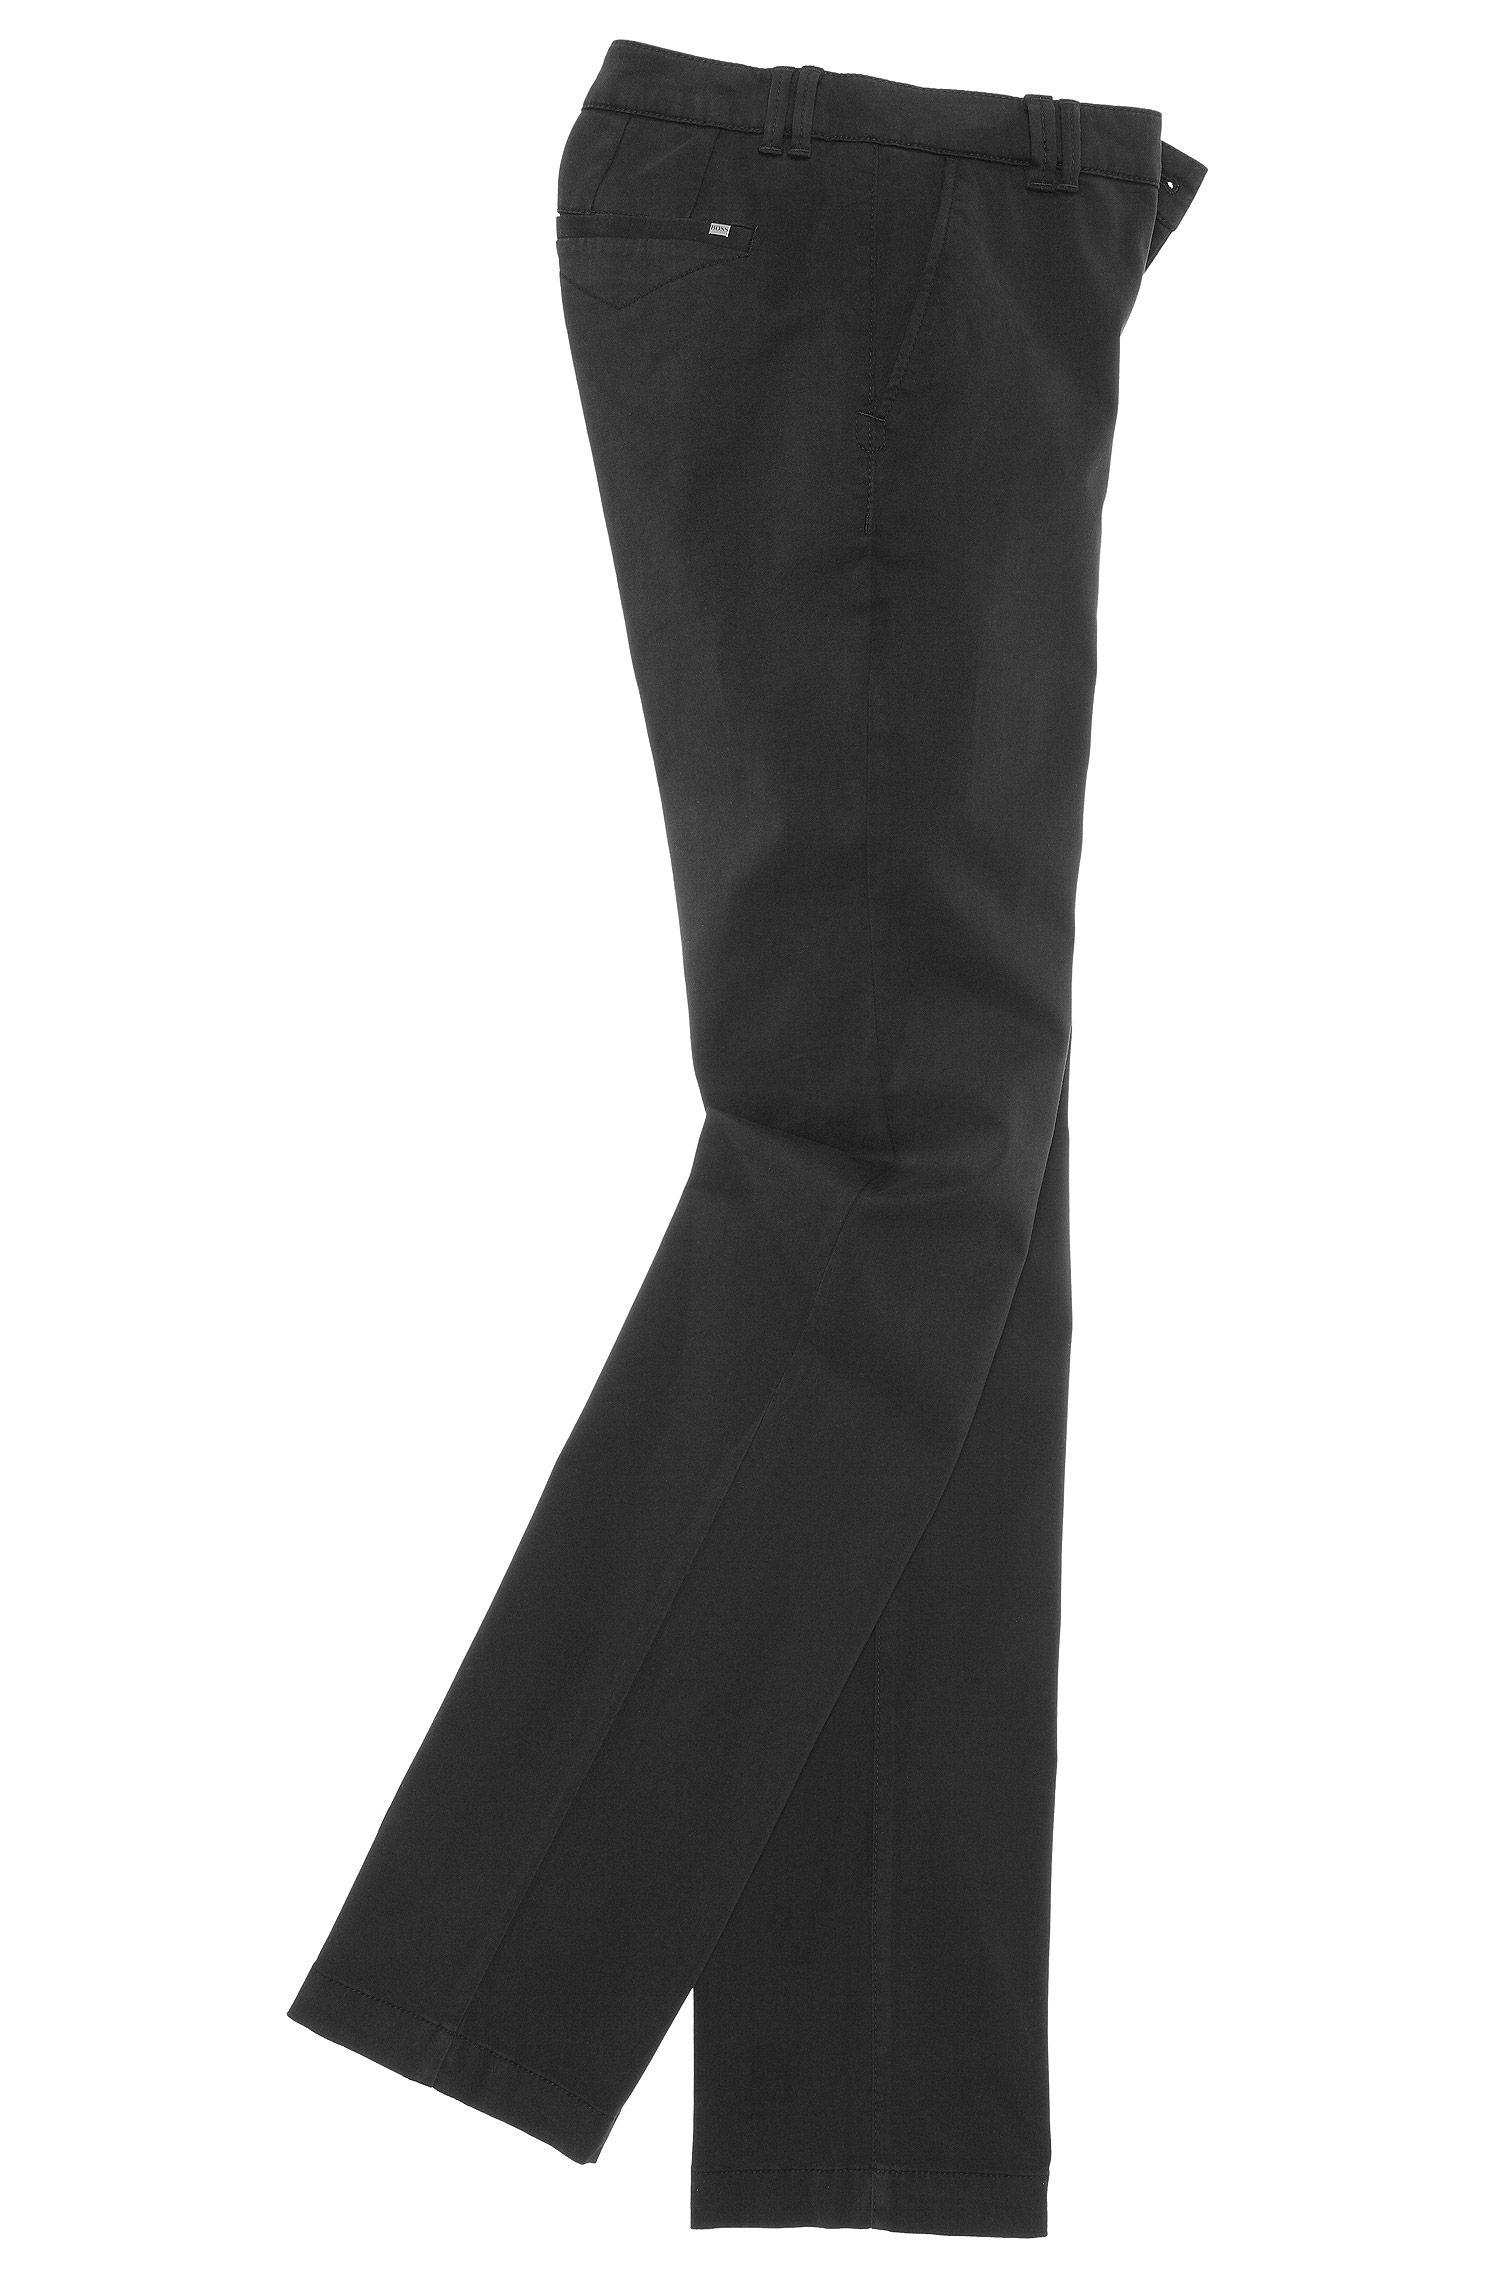 Katoenen broek ´Heliah 2-W` met chino-look